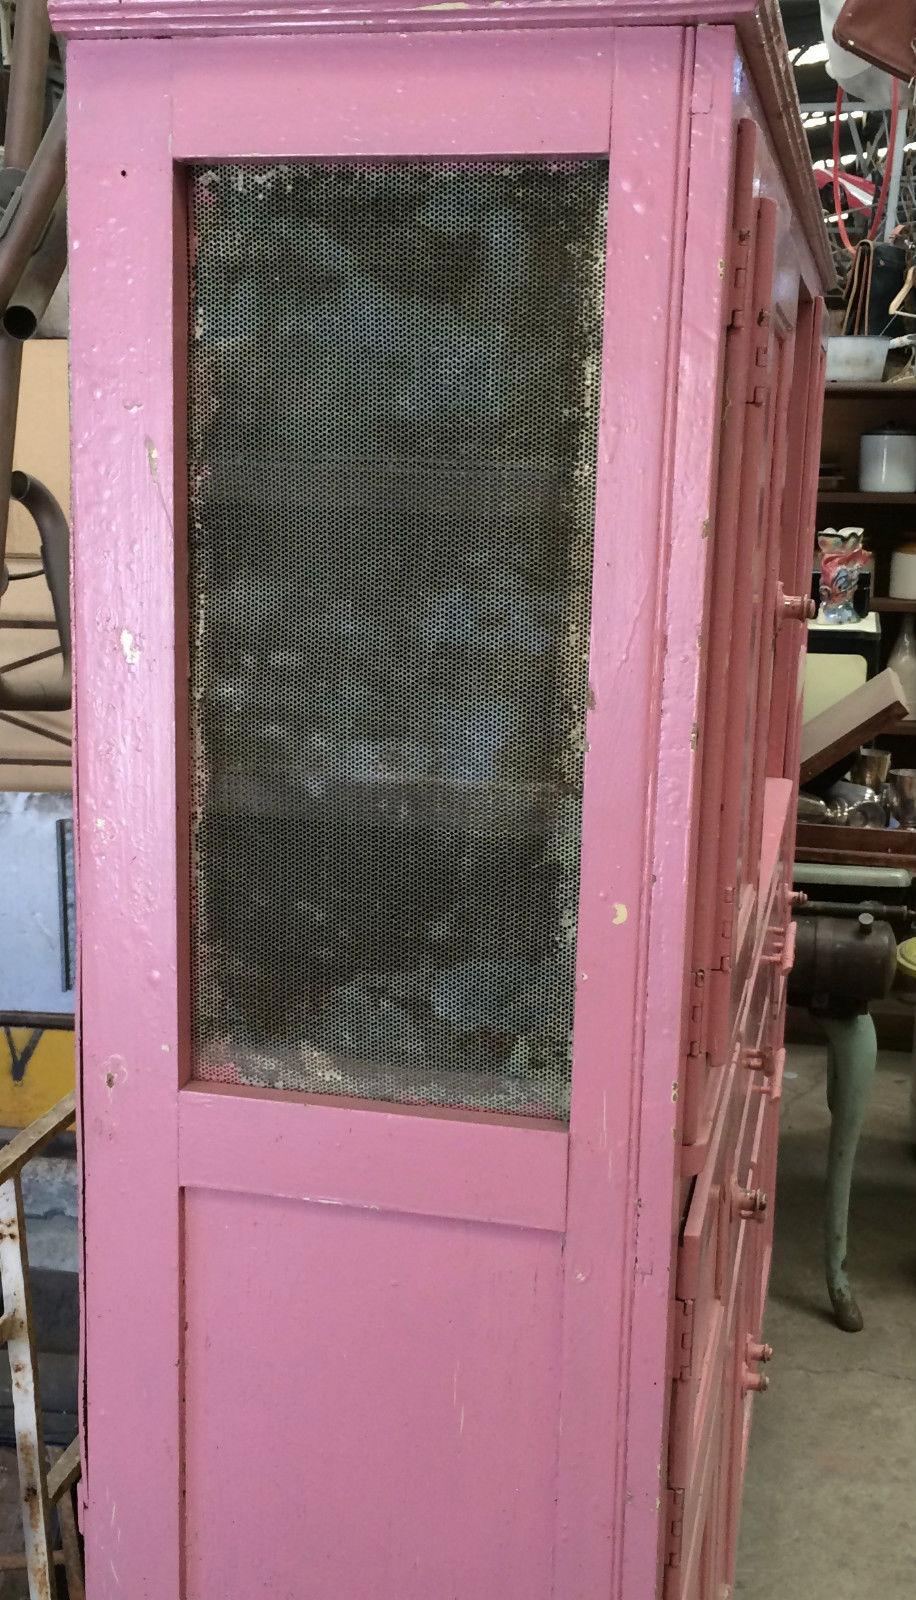 Vintage Shabby Distressed Rustic Kitchen Dresser Cupboard Cabinet | Halsey Road RecyclersVintage Shabby Distressed Rustic Kitchen Dresser Cupboard Cabinet | Halsey Road Recyclers